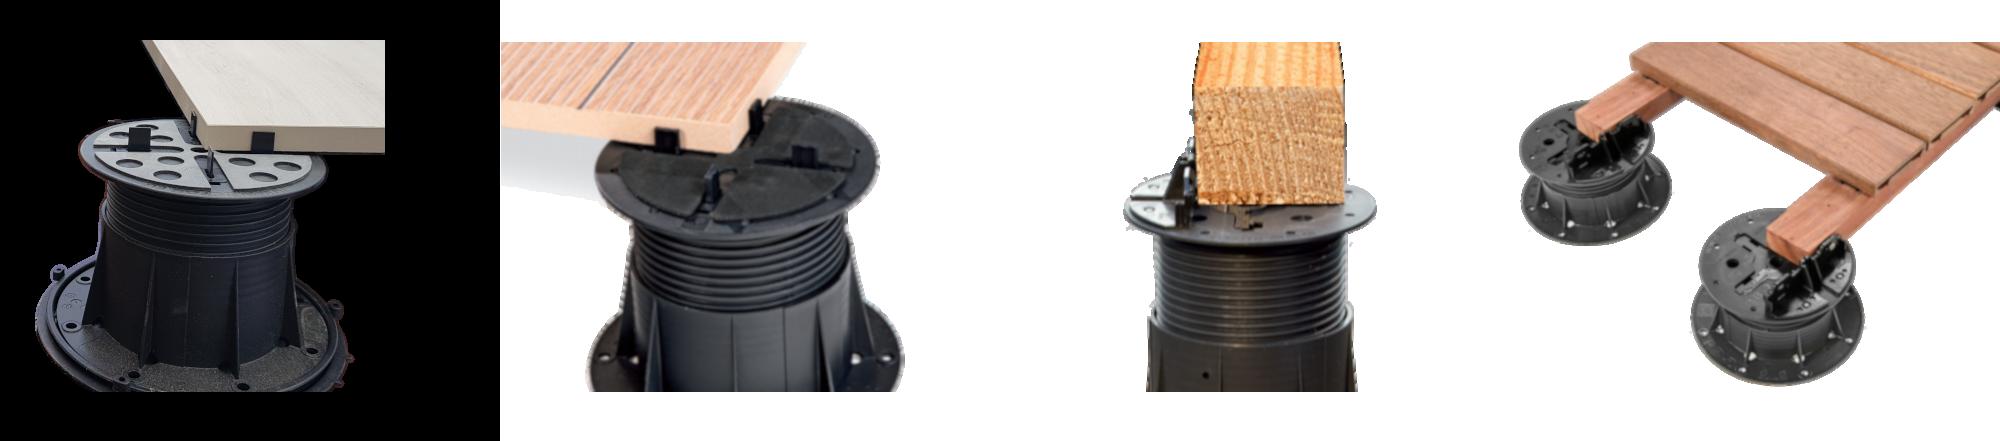 Detaily použití rektifikačních terčů Buzon pod dlažbu i terasu